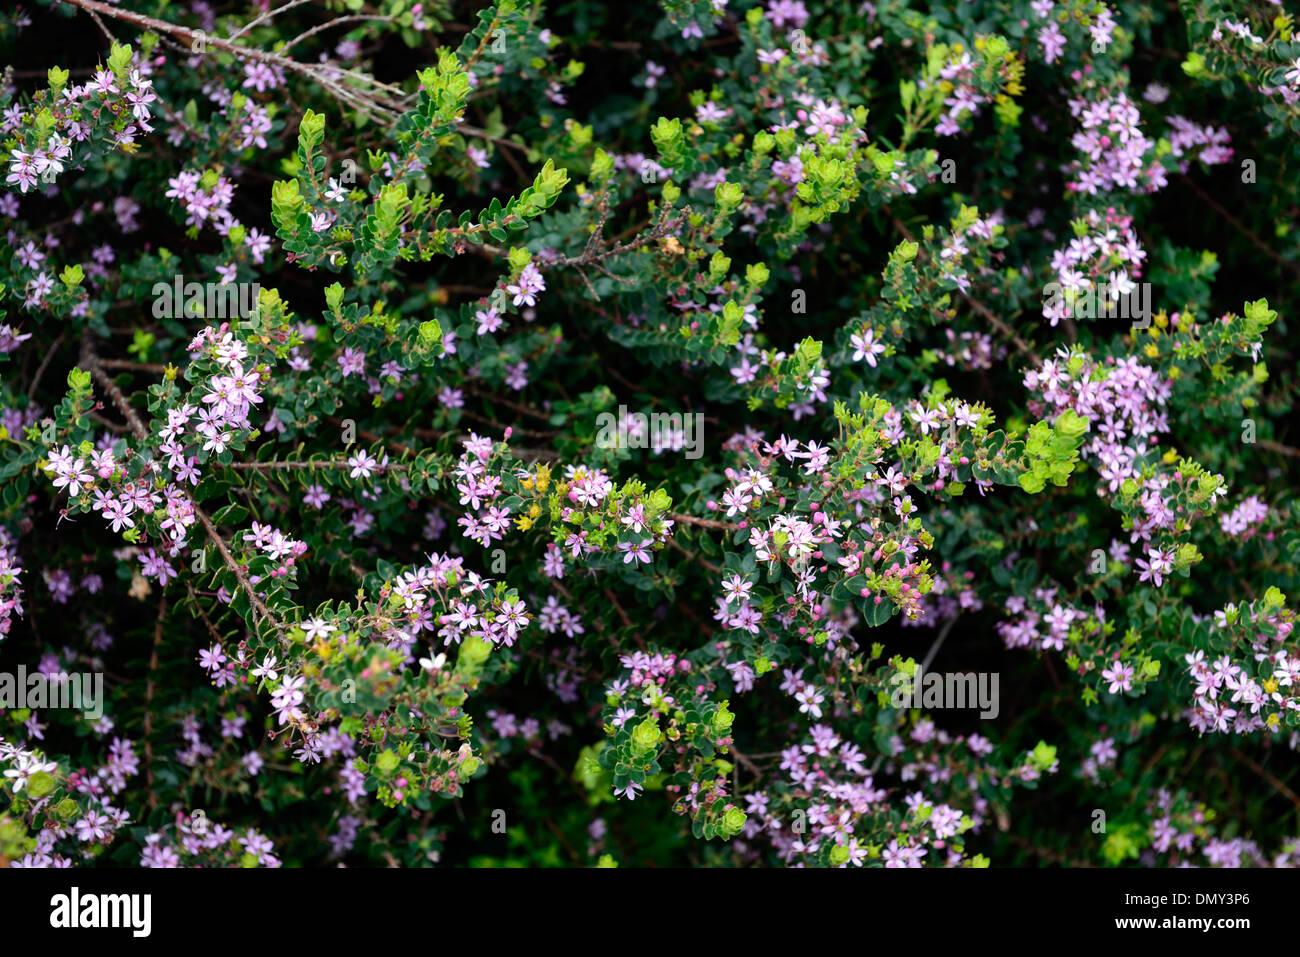 Agathosma ovata kluitjieskraal false buchu pink flowers compact agathosma ovata kluitjieskraal false buchu pink flowers compact evergreen shrub mightylinksfo